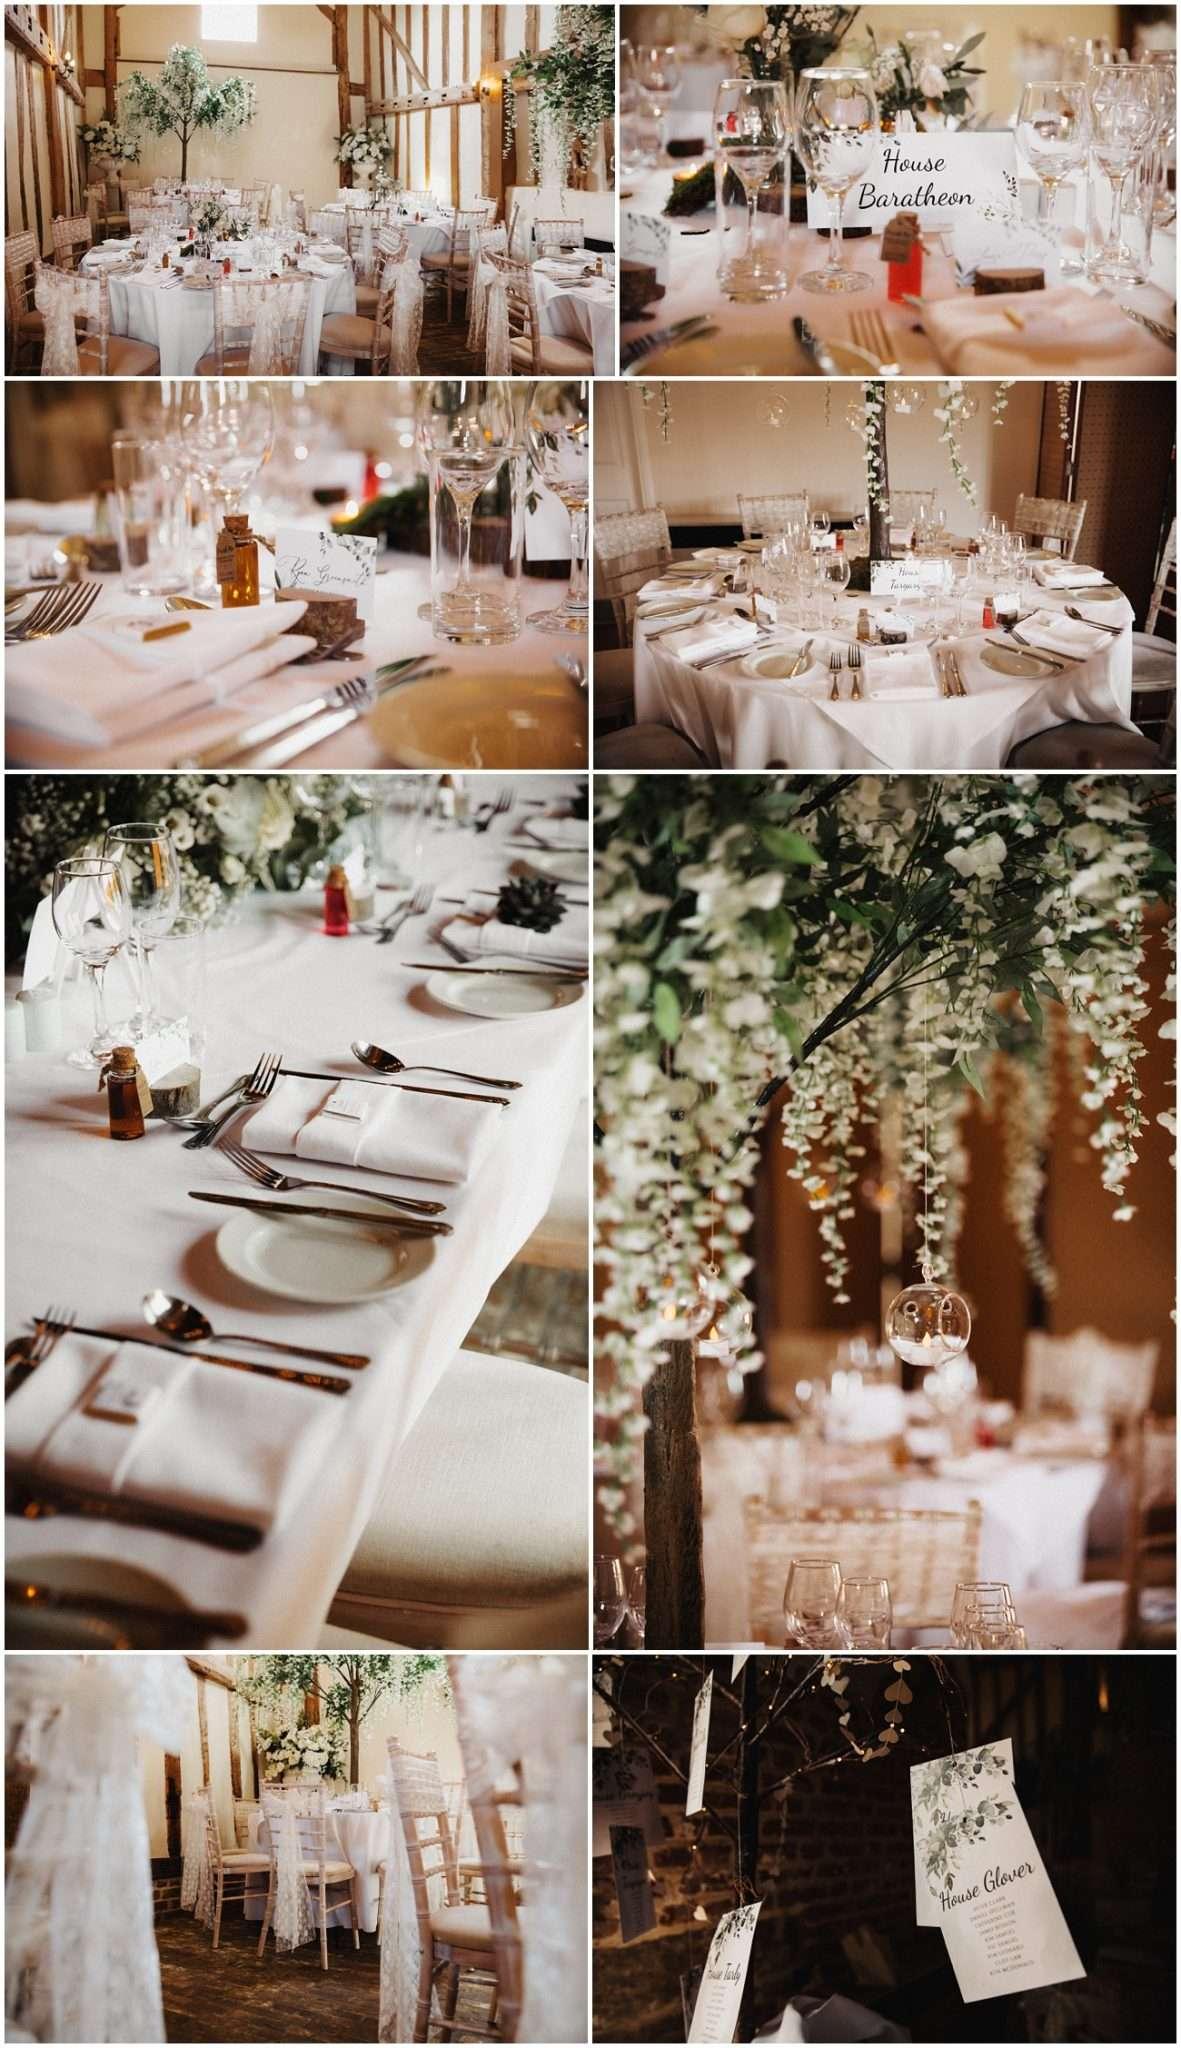 Wedding breakfast details of the room